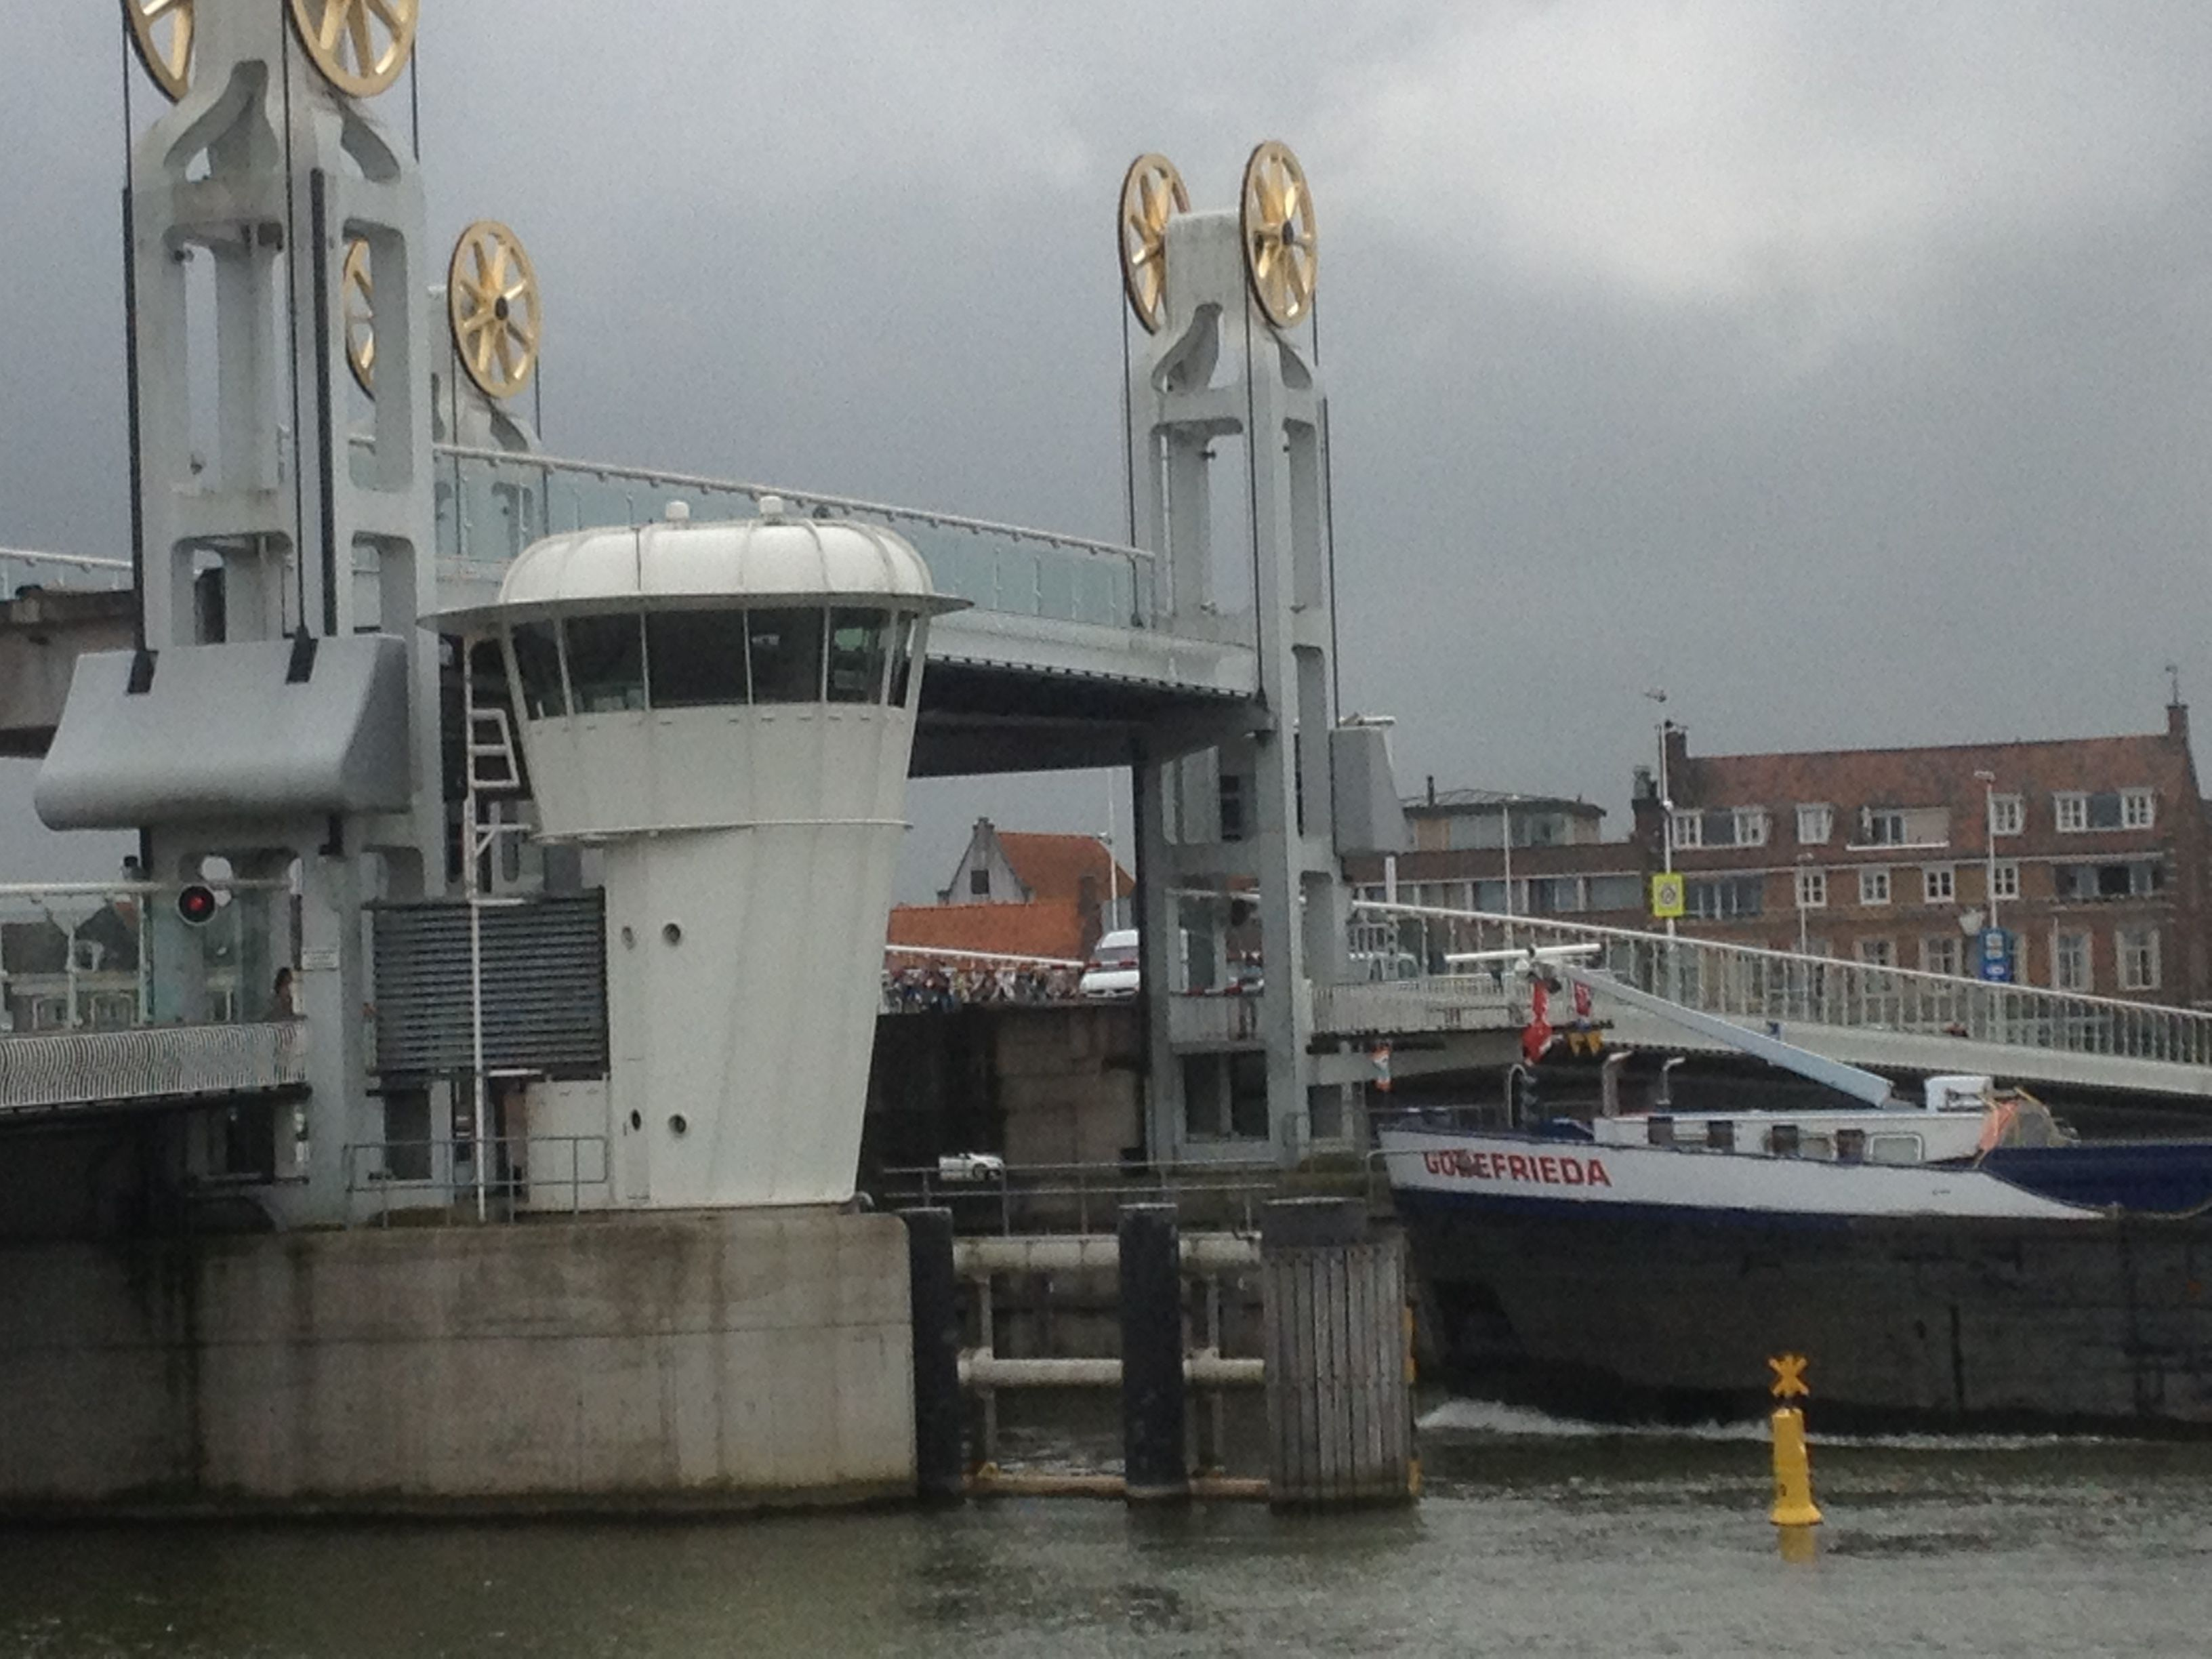 Brug in Kampen